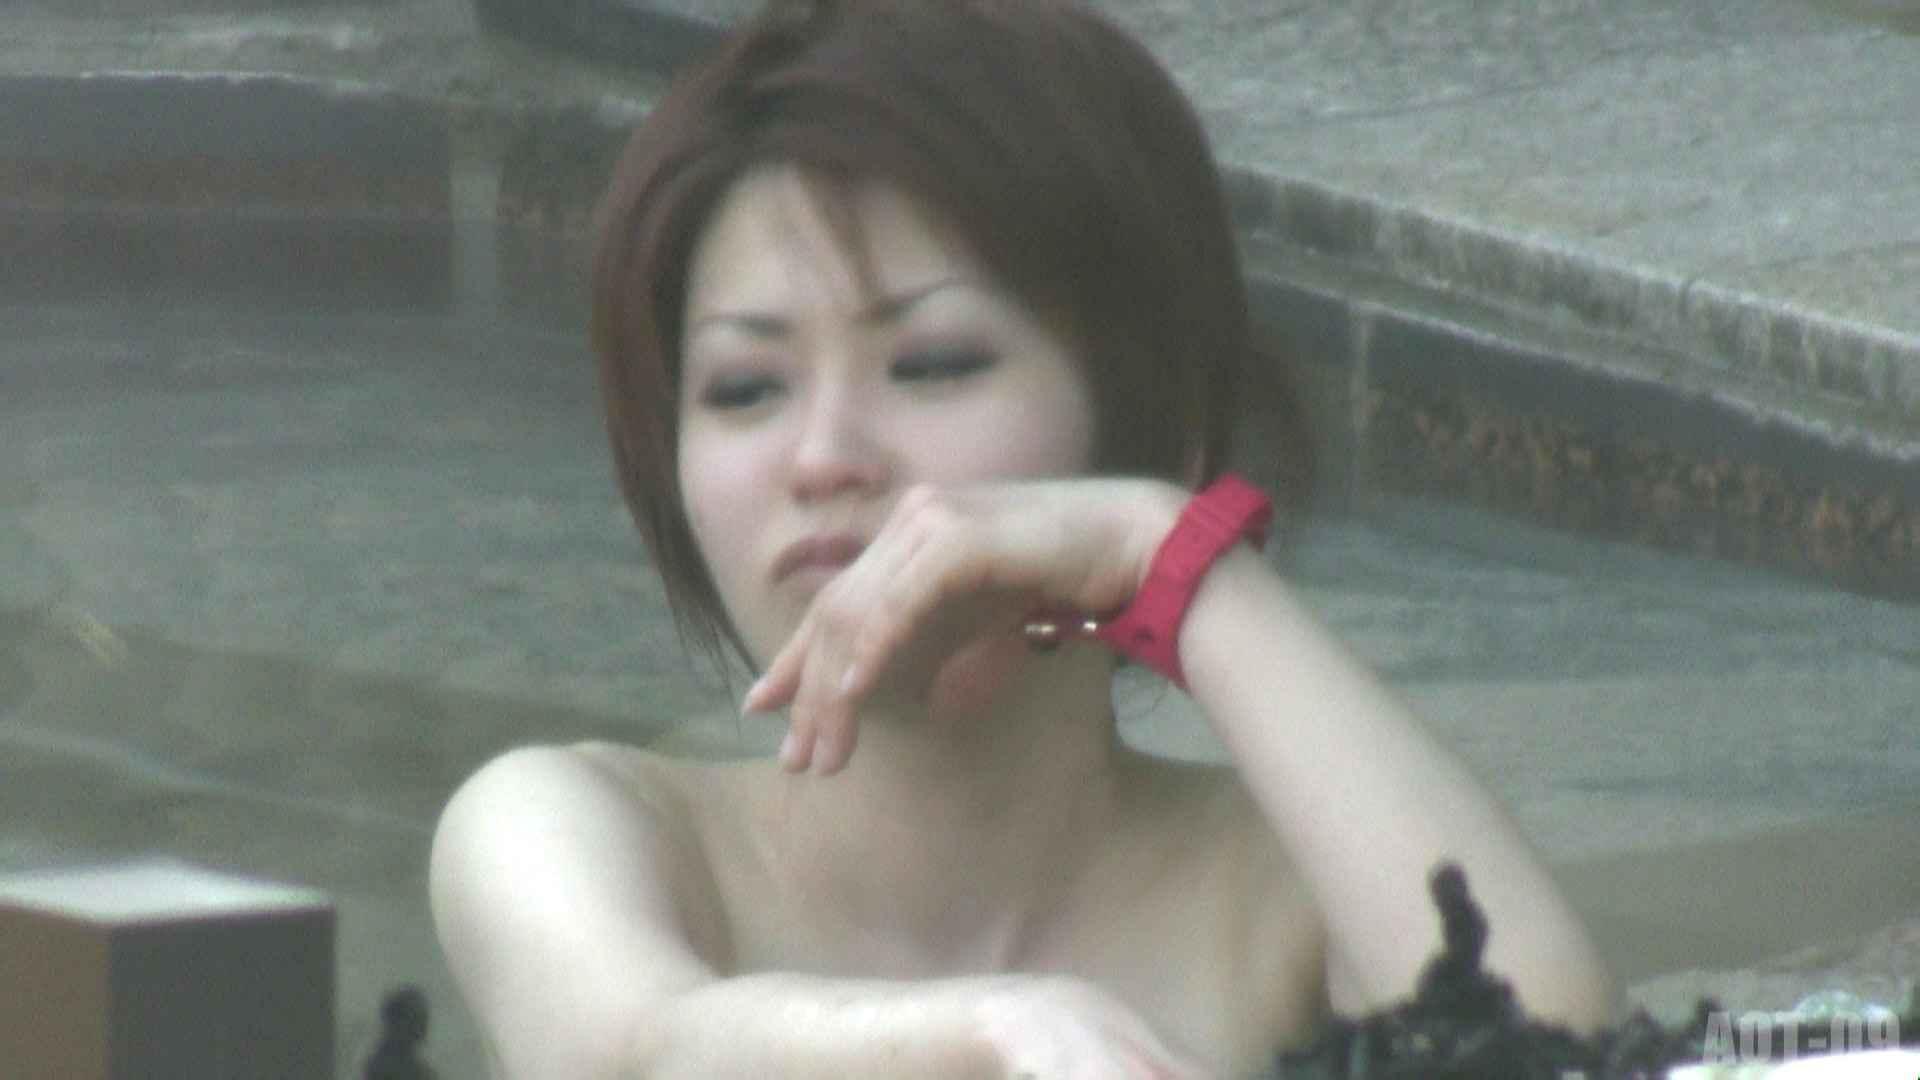 Aquaな露天風呂Vol.779 盗撮 SEX無修正画像 81連発 77